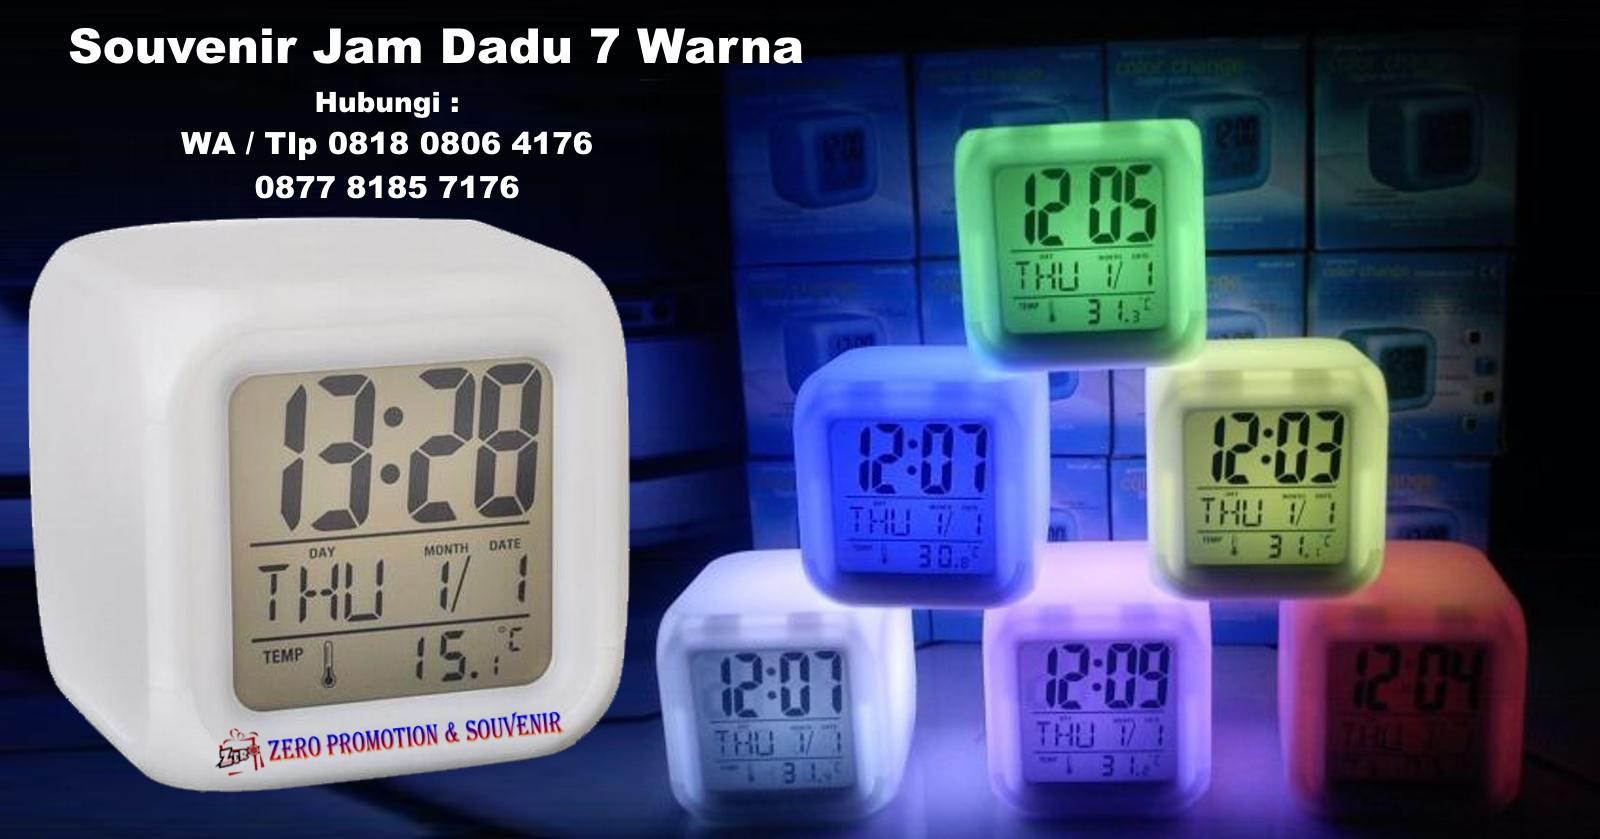 Souvenir Jam Dadu 7 Warna Plus Alarm Dan Termometer  fe94a3b69e